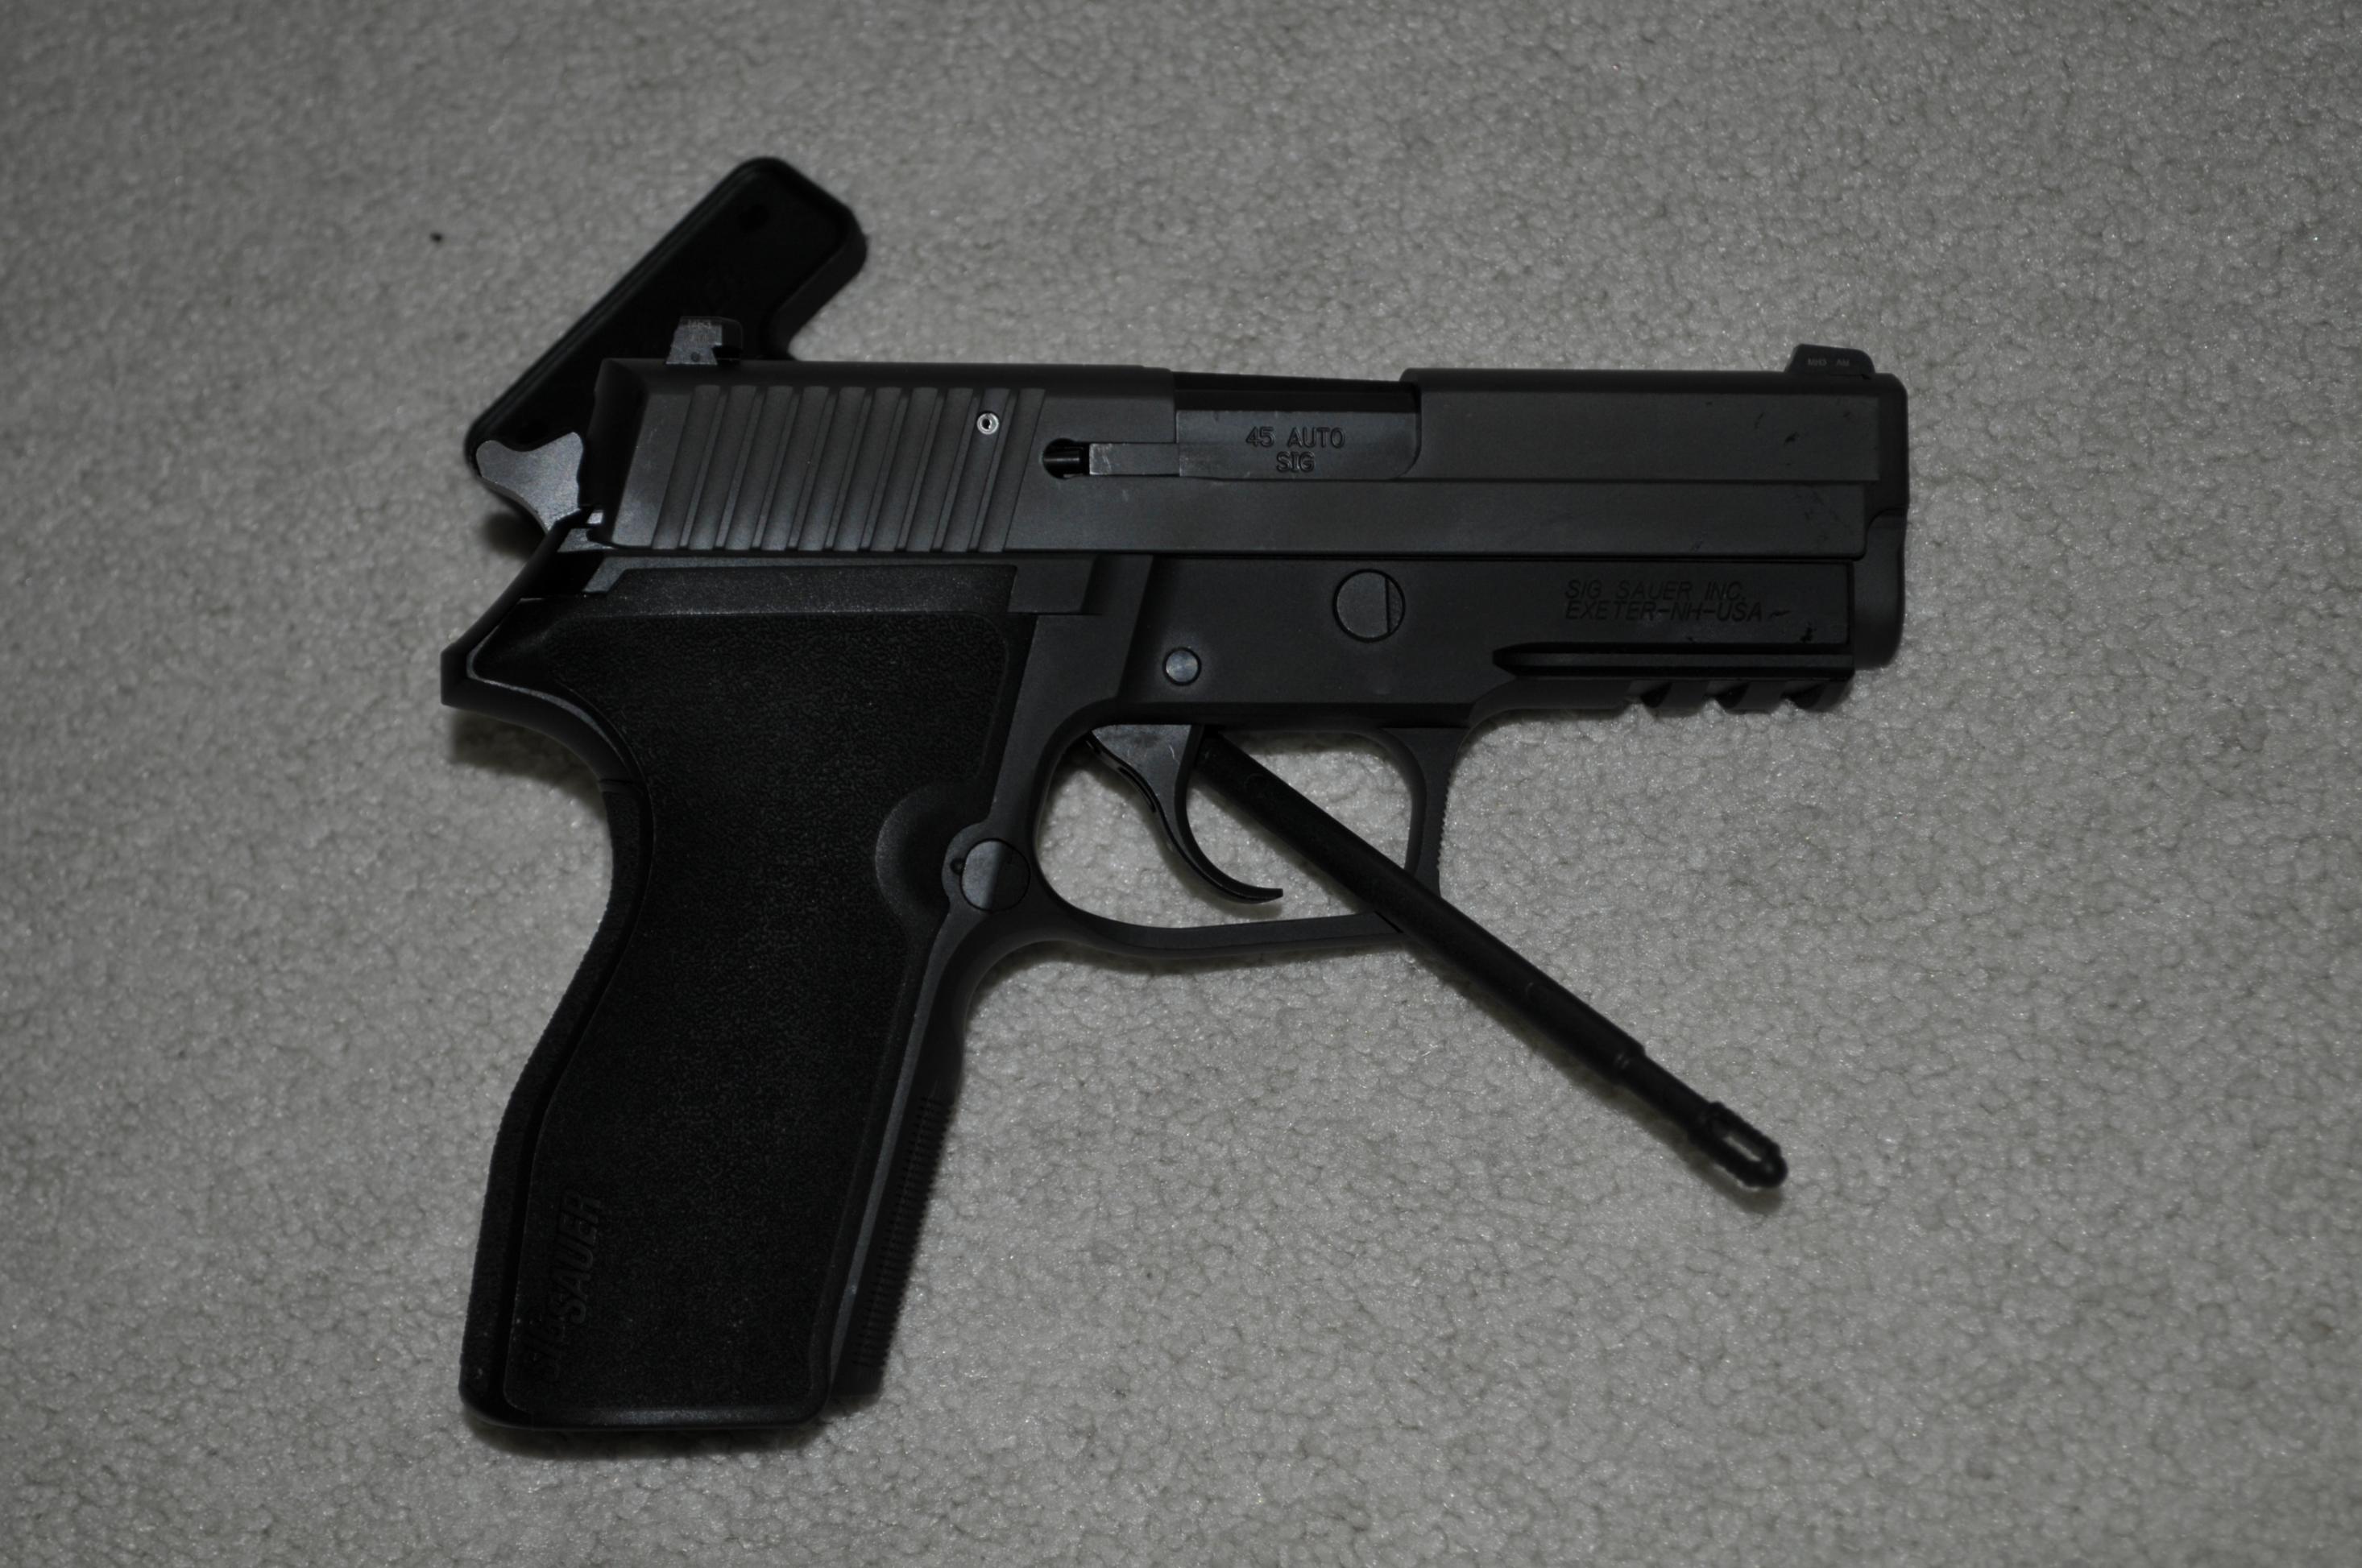 "WTS: Sig Sauer P227 .45 ACP Carry Nitron 3.9"" Barrel 2 Factory mags (WI)-_1rl9433.jpg"